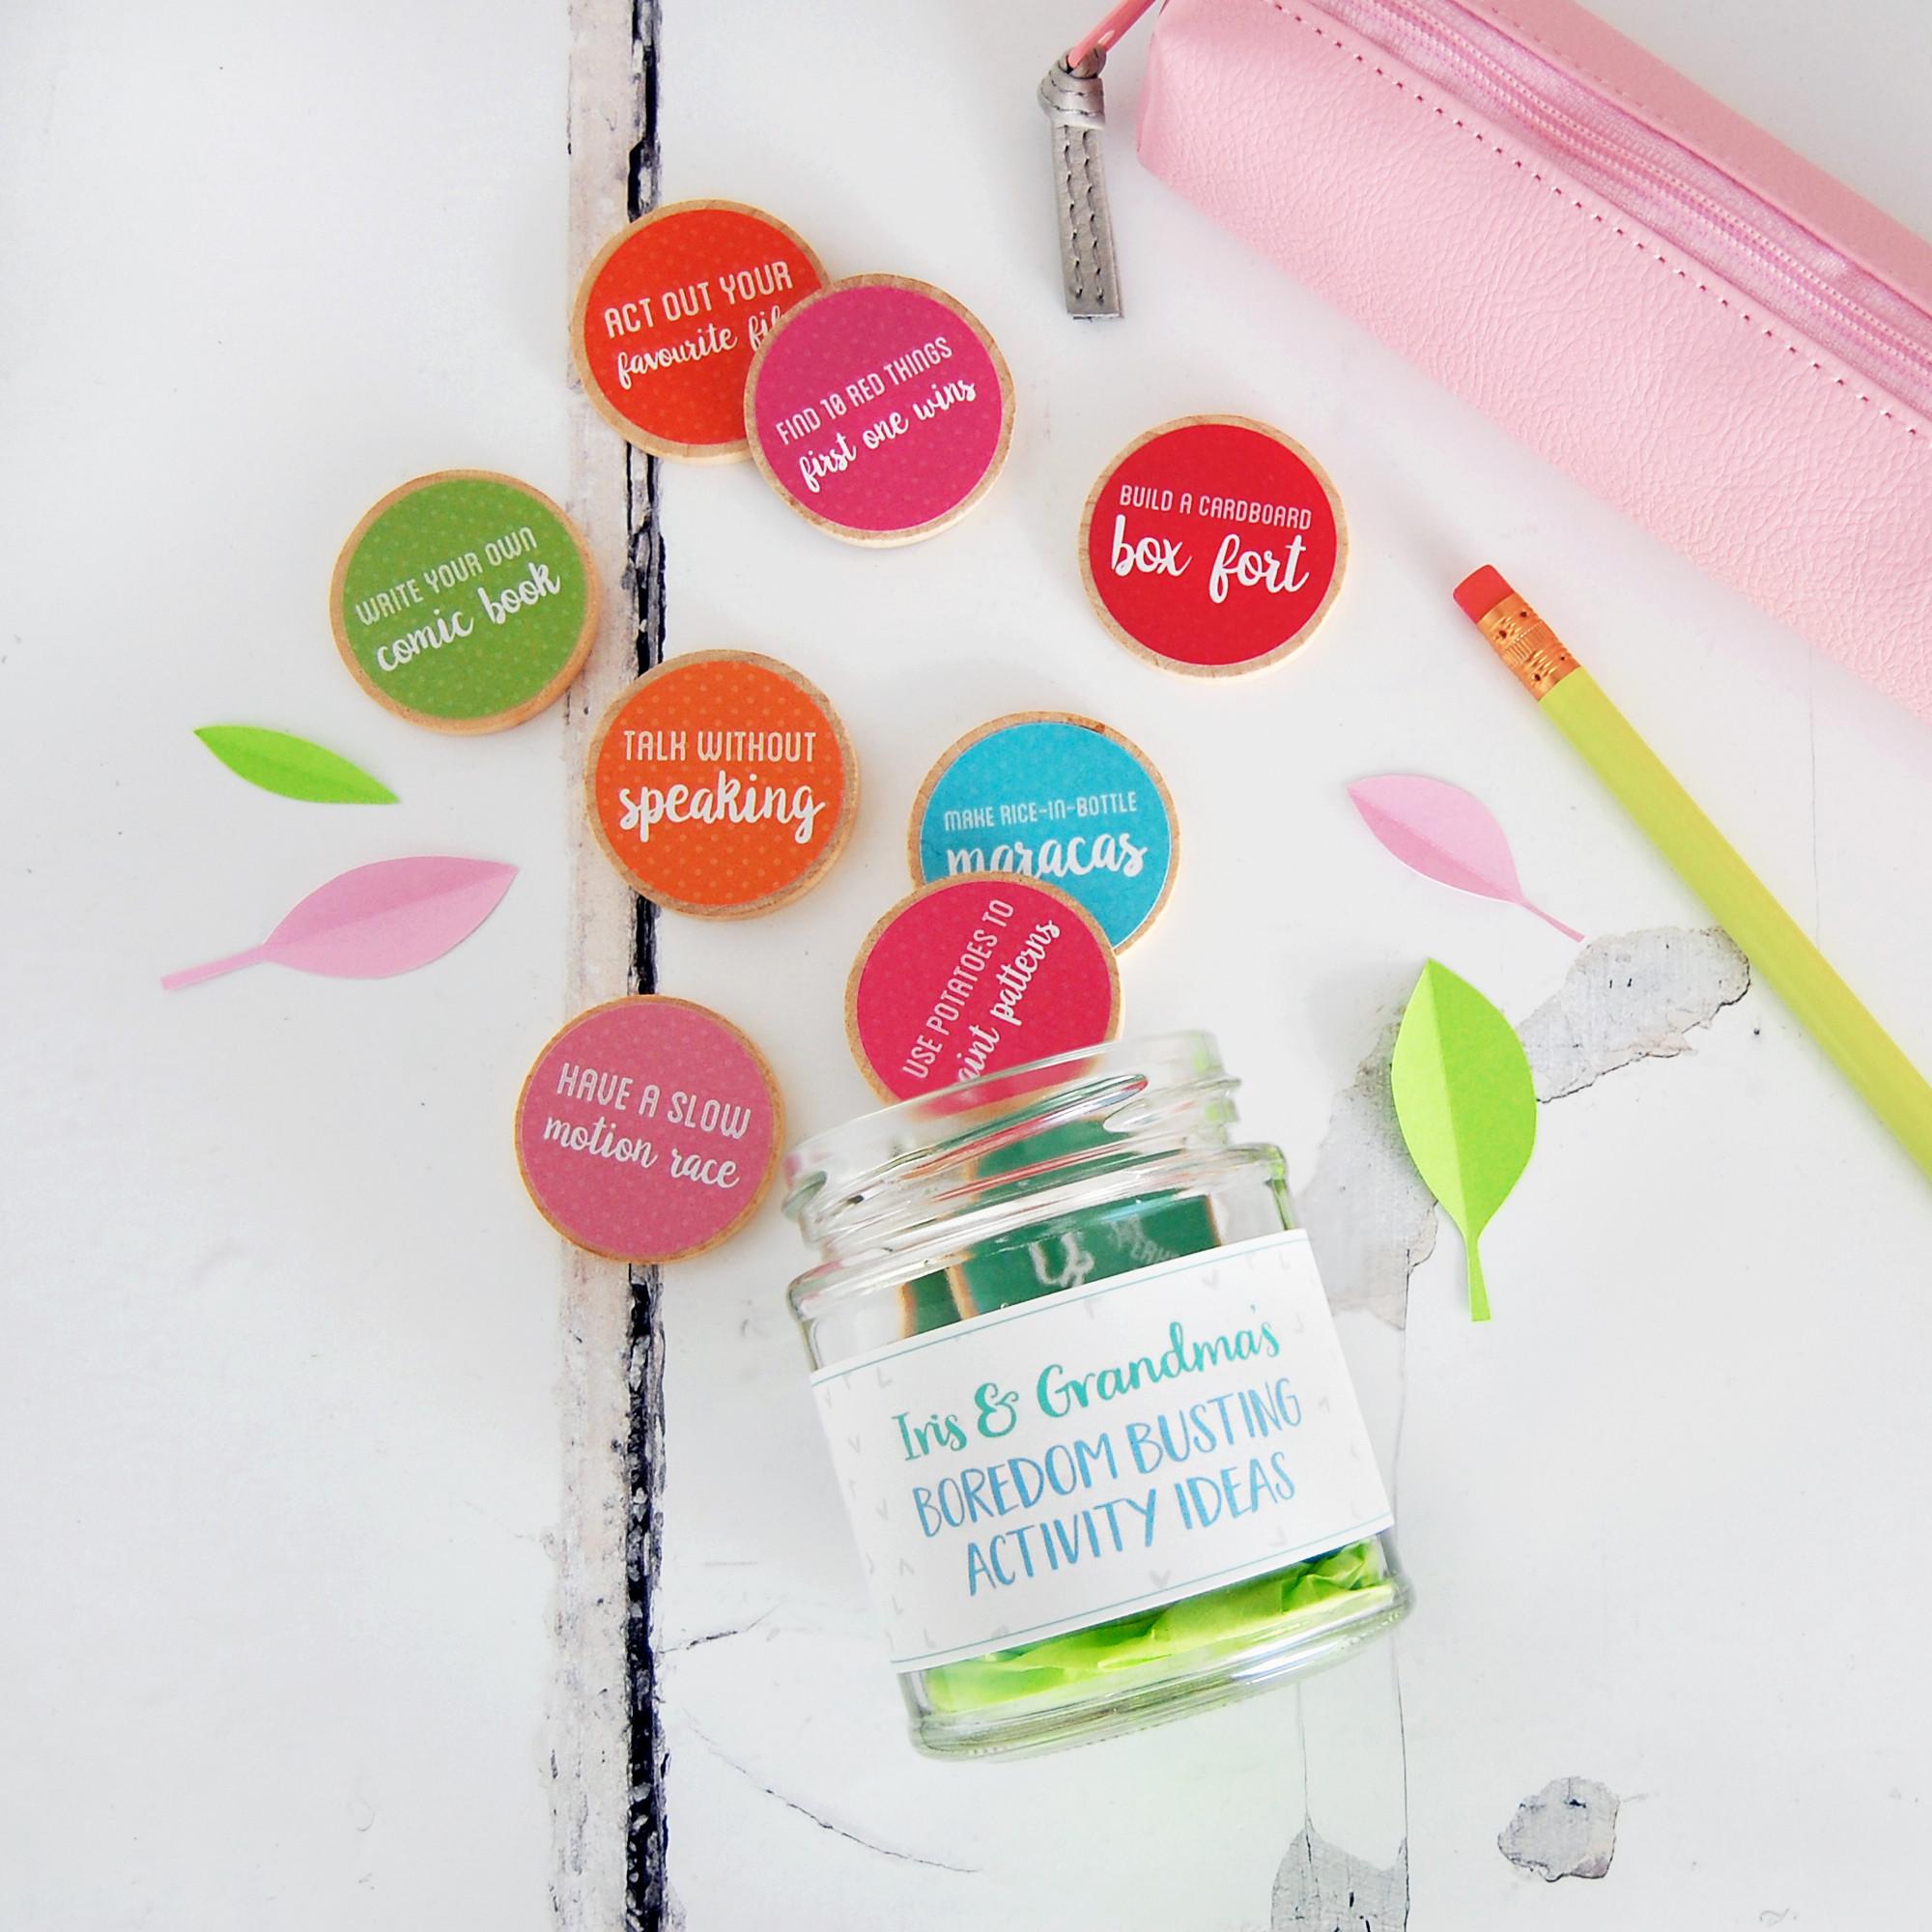 Quirky Wedding Gift Ideas Australia : Personalised Grandma And Me Activity Ideas Jar hardtofind.